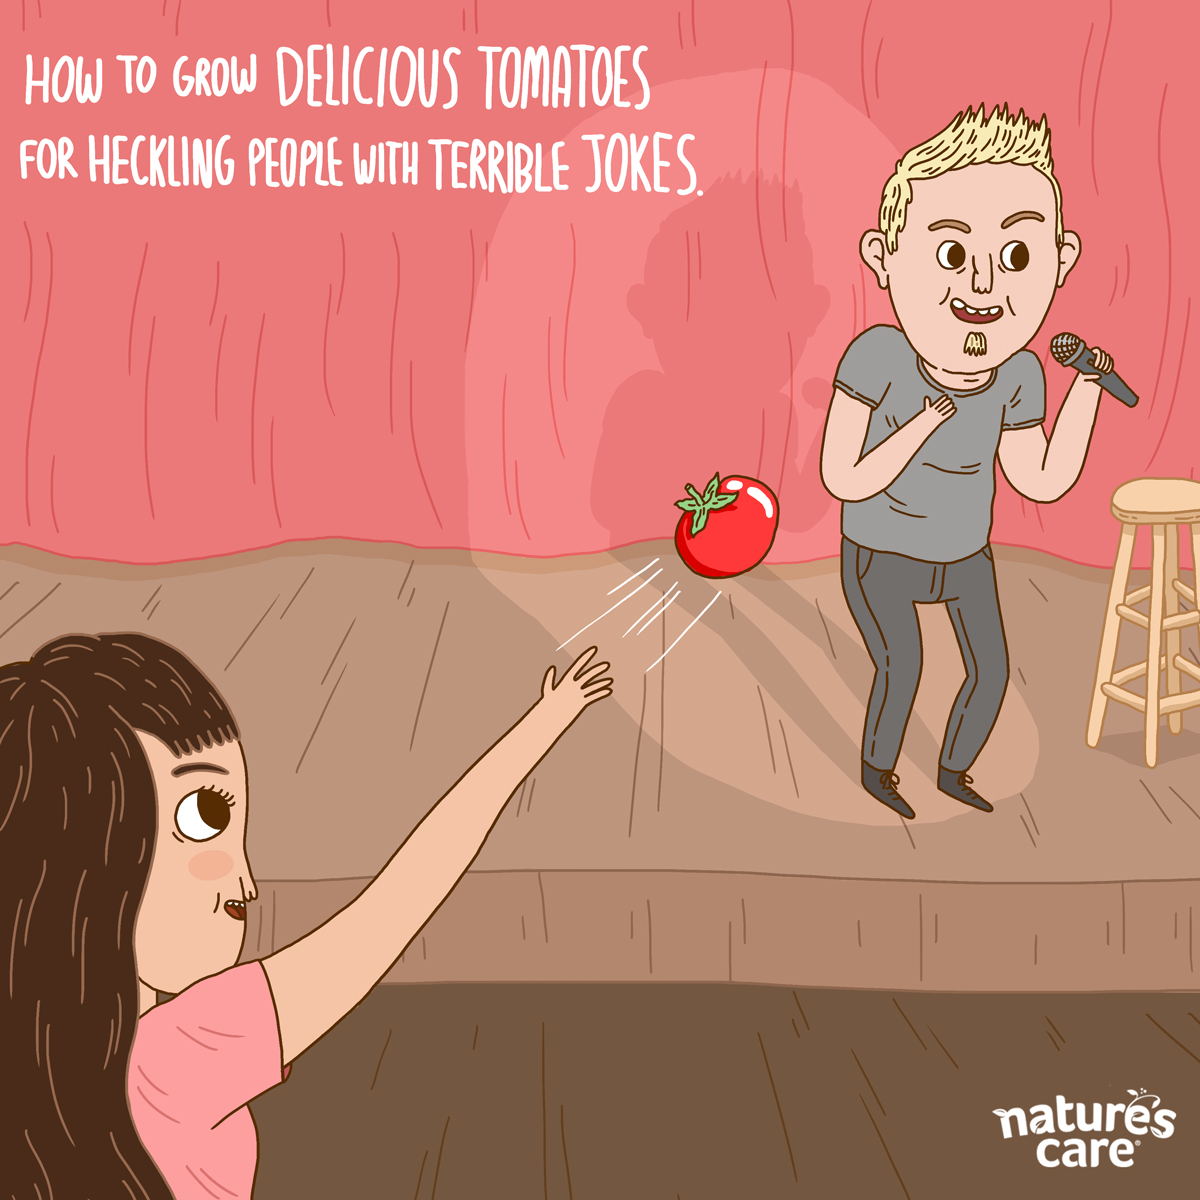 BFG-Nature's-Care-Tomato-colorV7.jpg